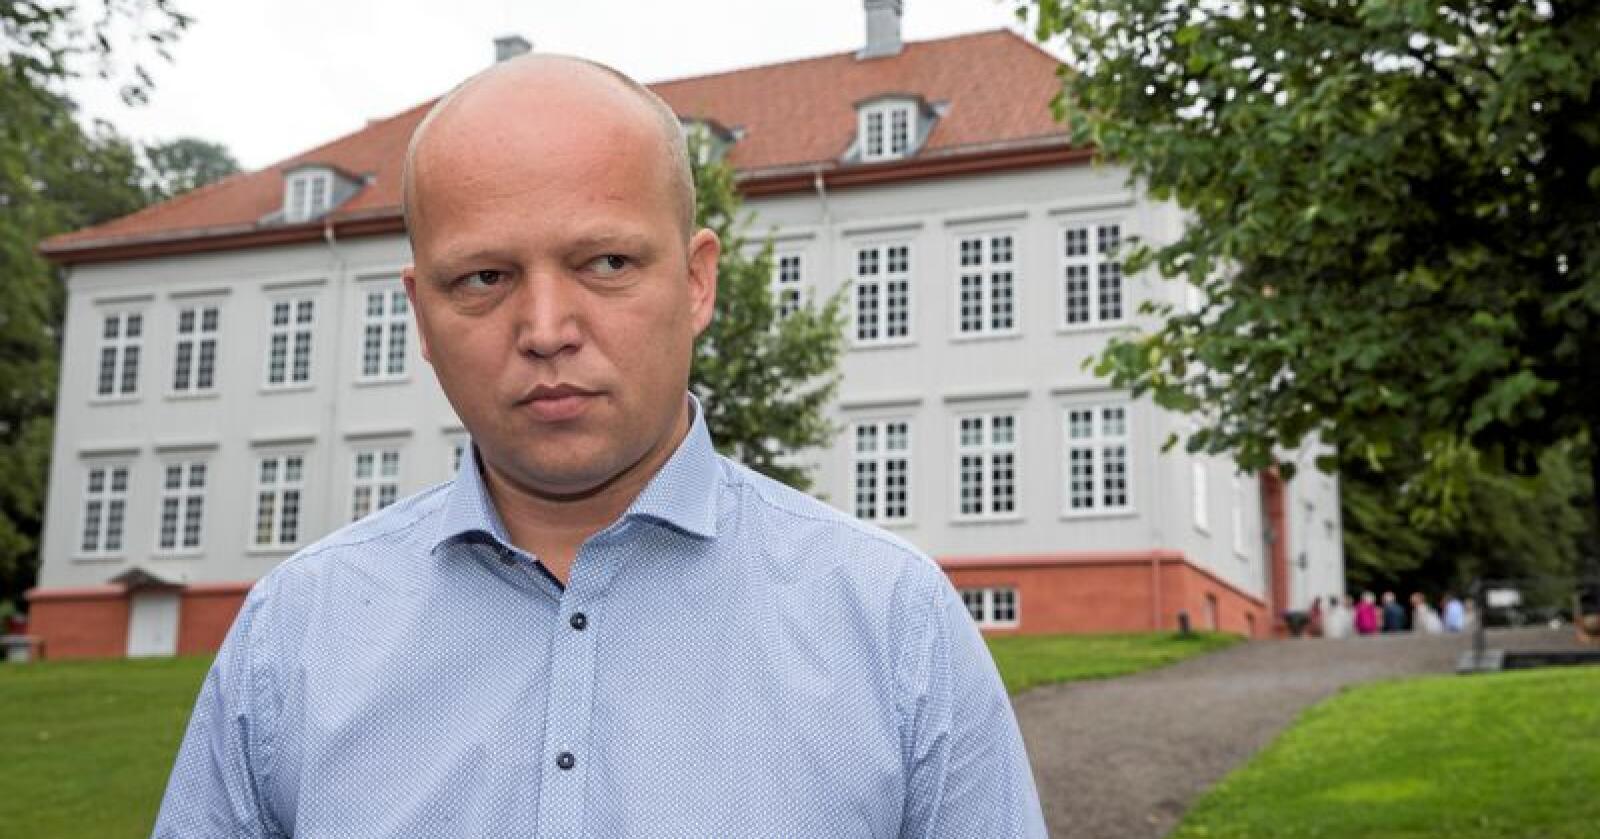 Sp-leder Trygve Magnus Slagsvold Vedum. Foto: Terje Pedersen / NTB scanpix